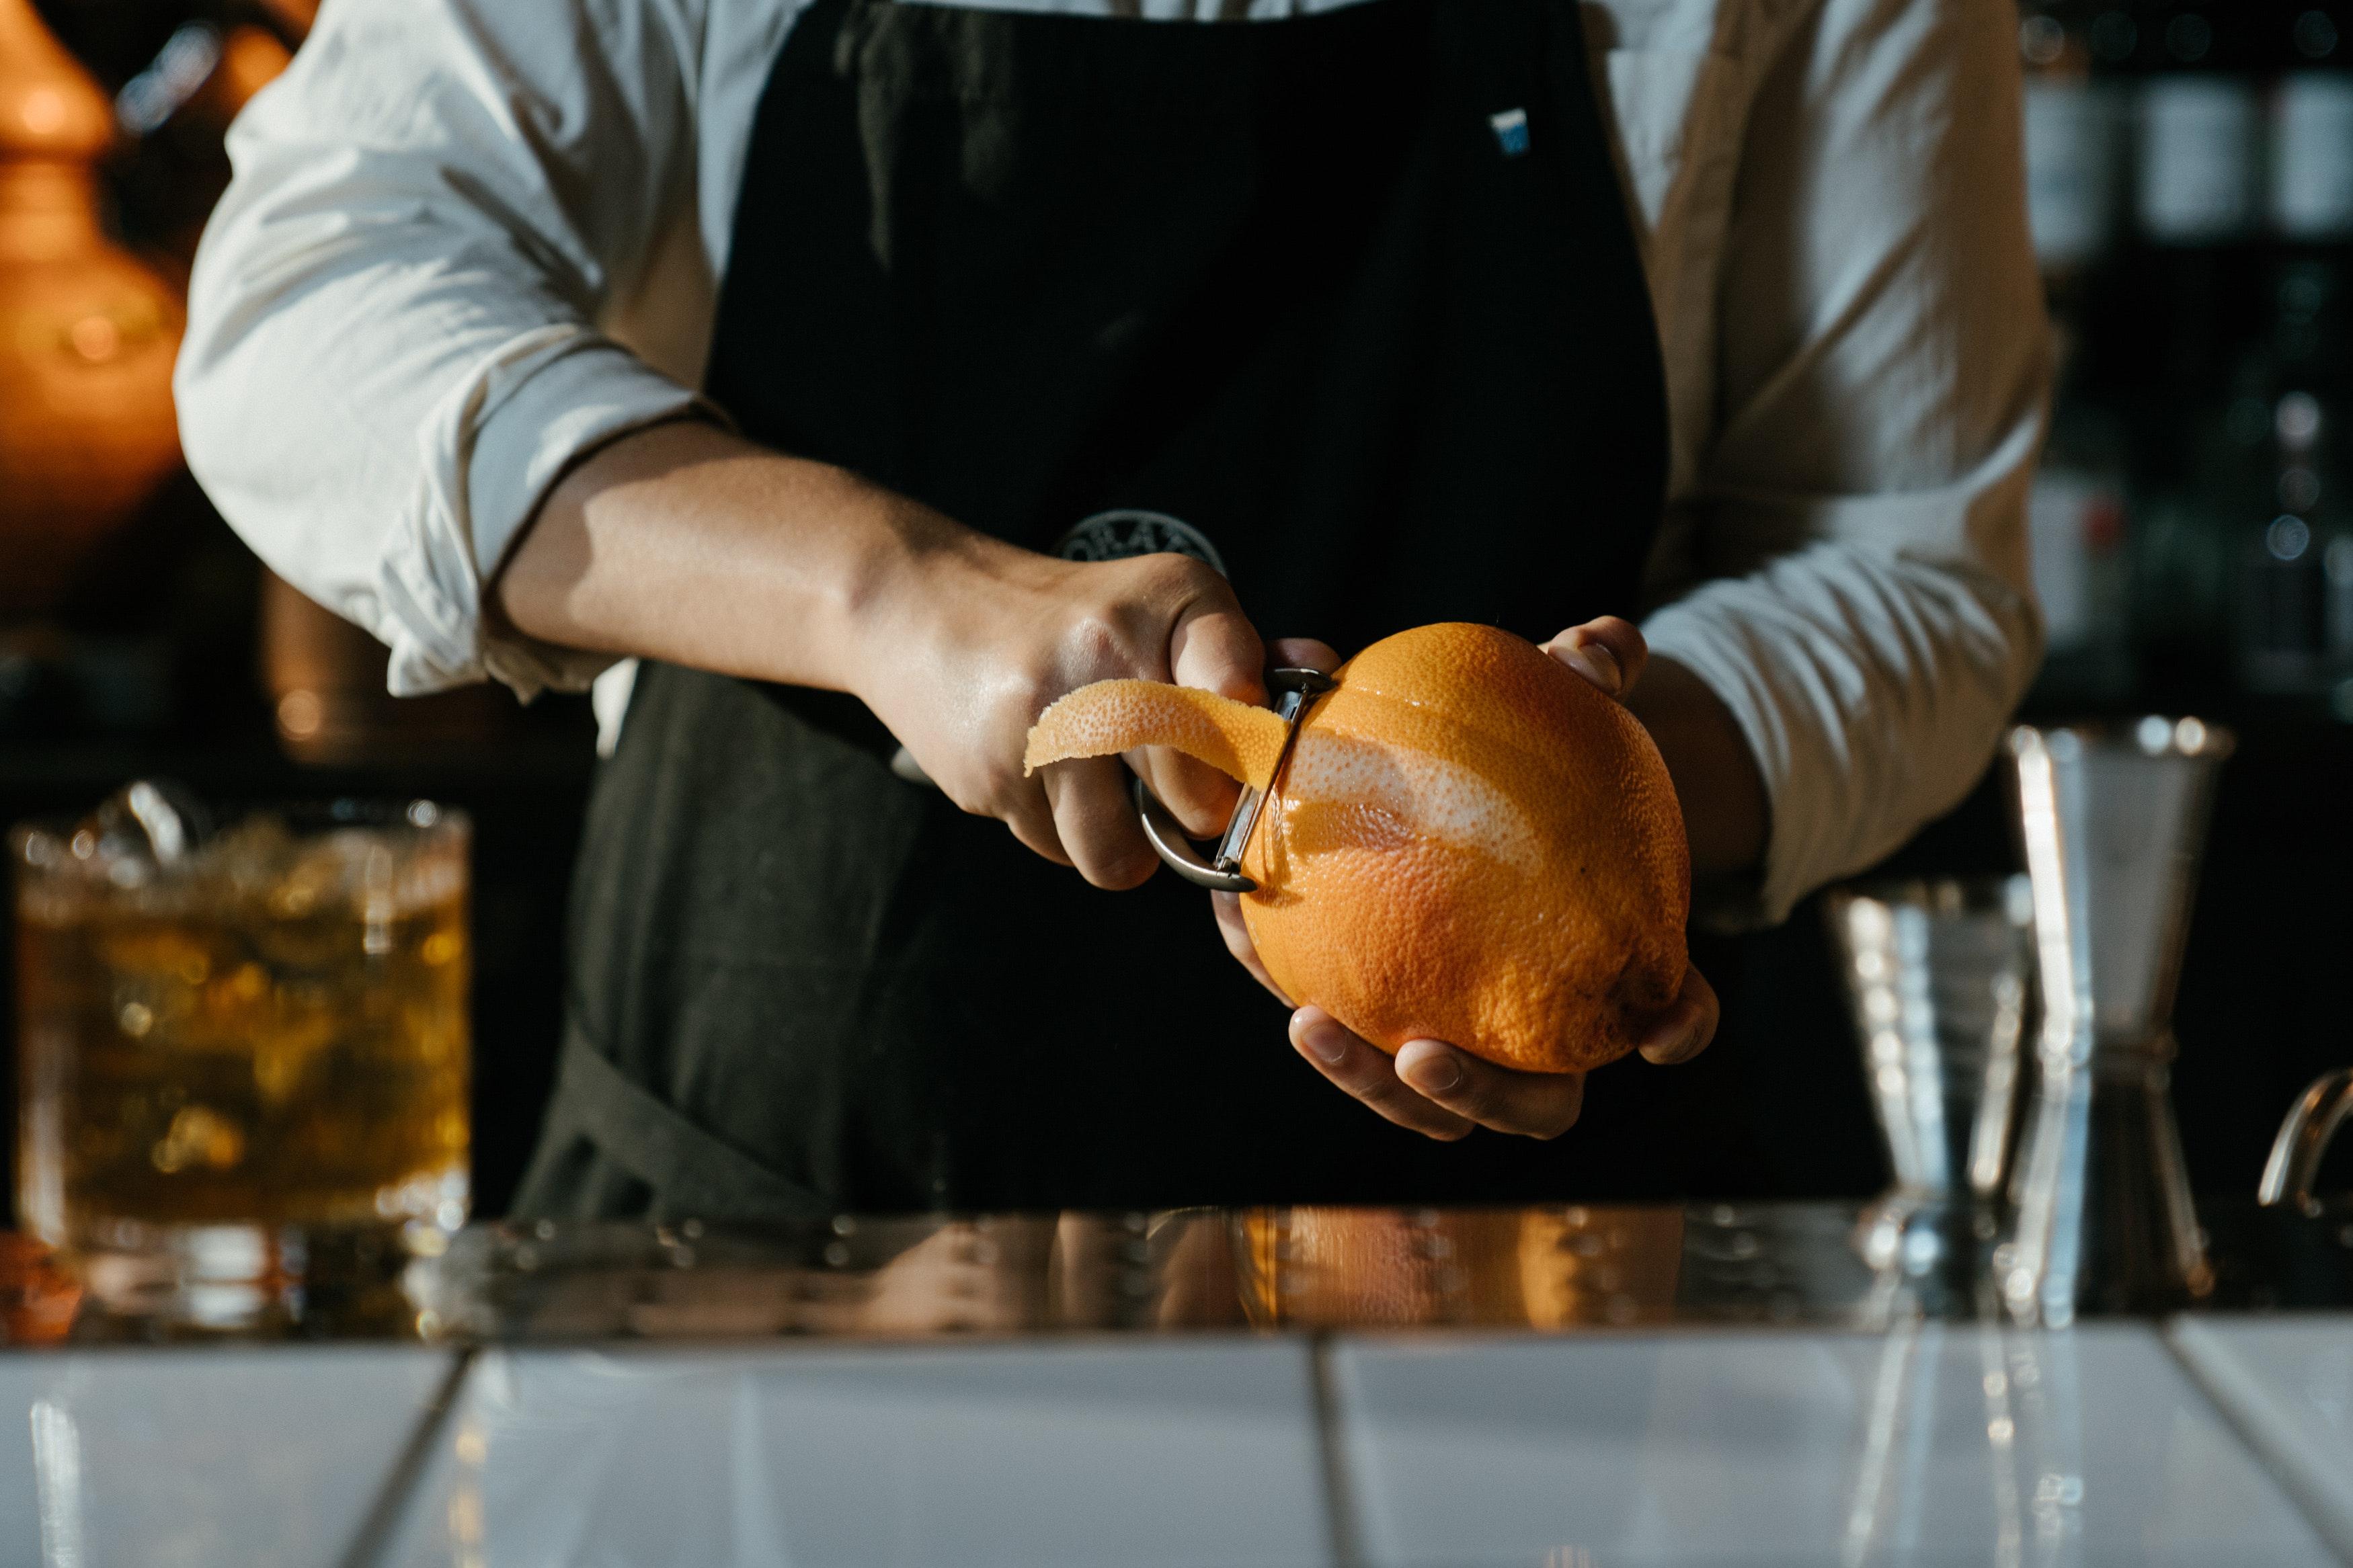 A bartender using a peeler to peel an orange.